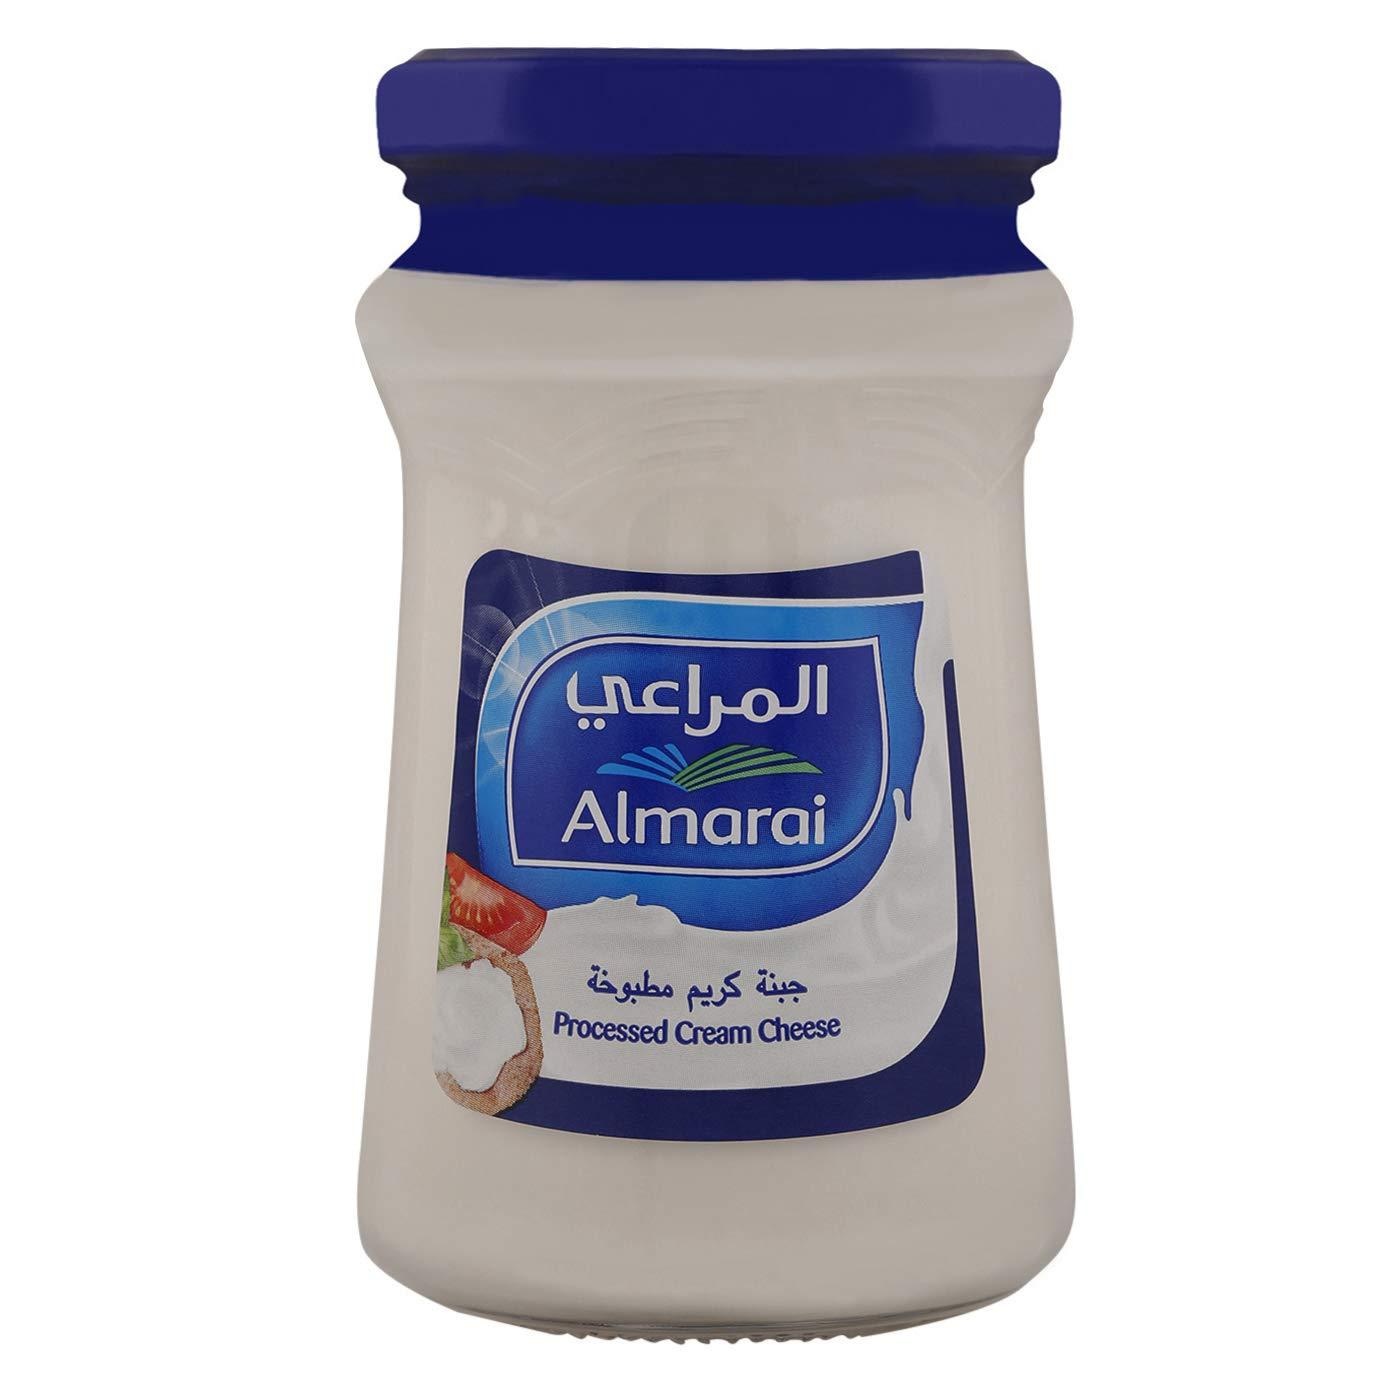 Almarai Processed Cream Cheese (200g)